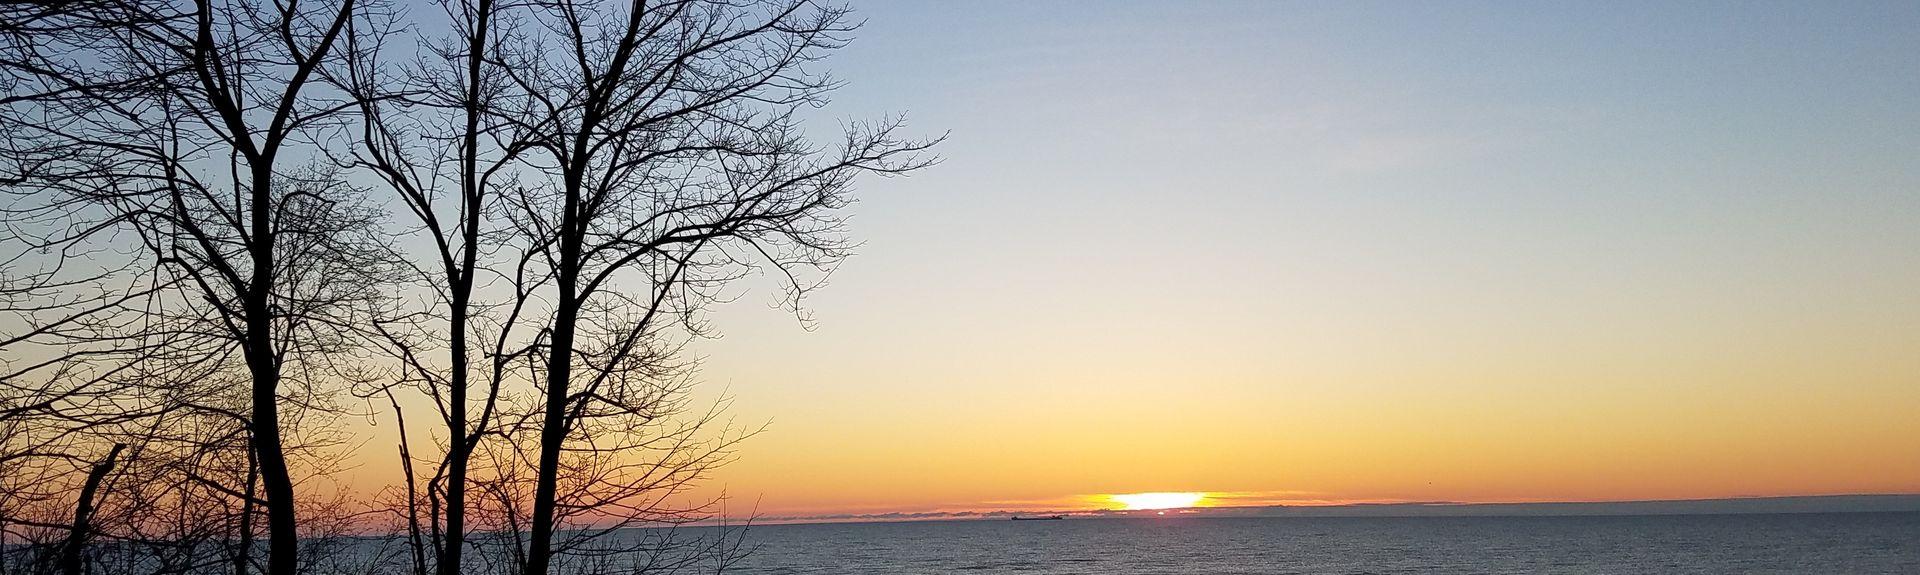 Harbor Beach Lighthouse, Harbor Beach, Michigan, United States of America